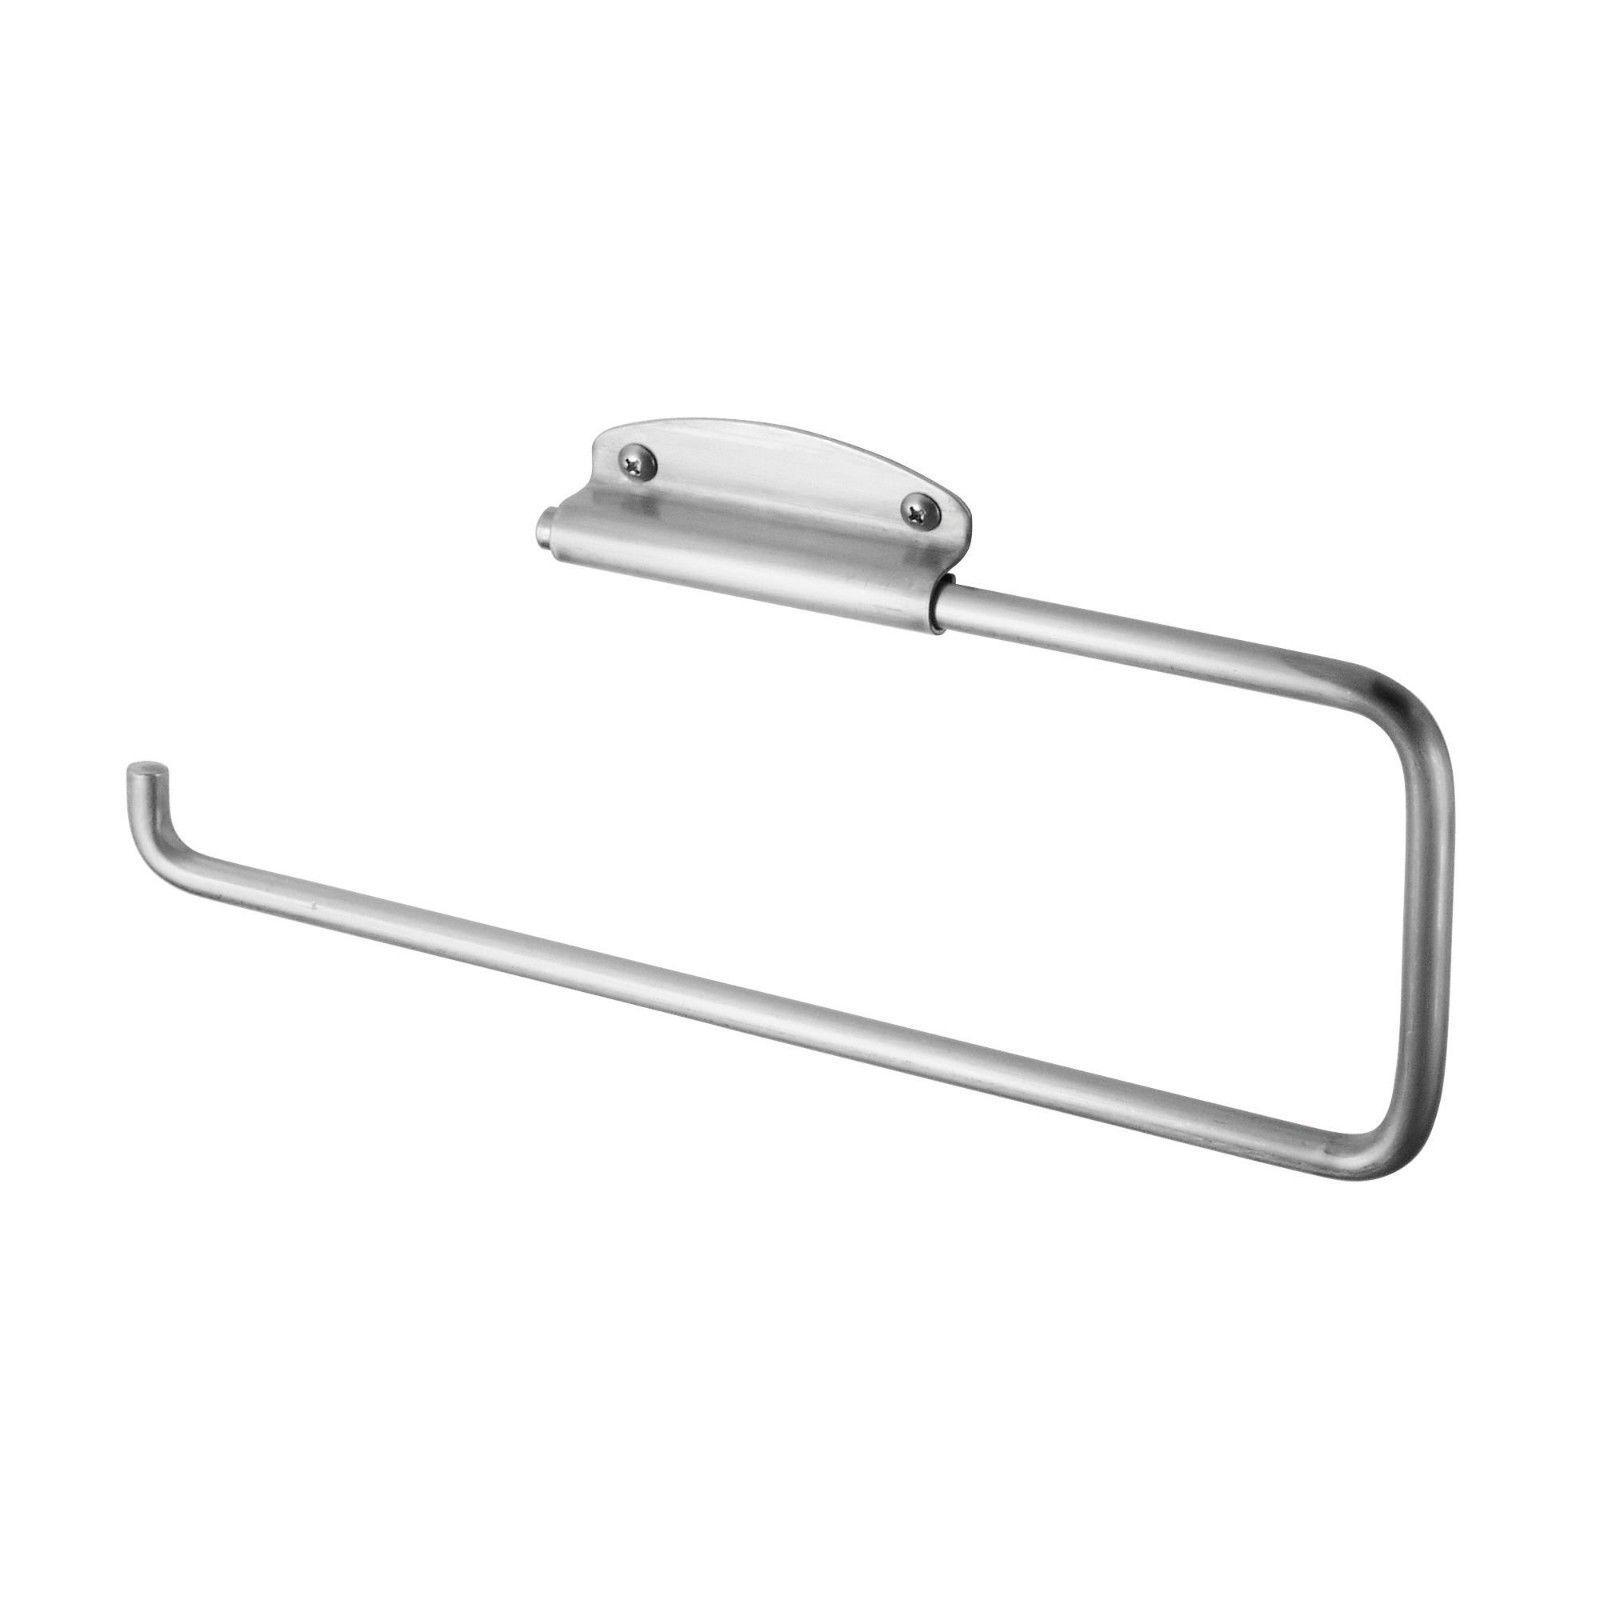 InterDesign Forma Towel Holder for Kitchen-Wall Mount/Under Cabinet